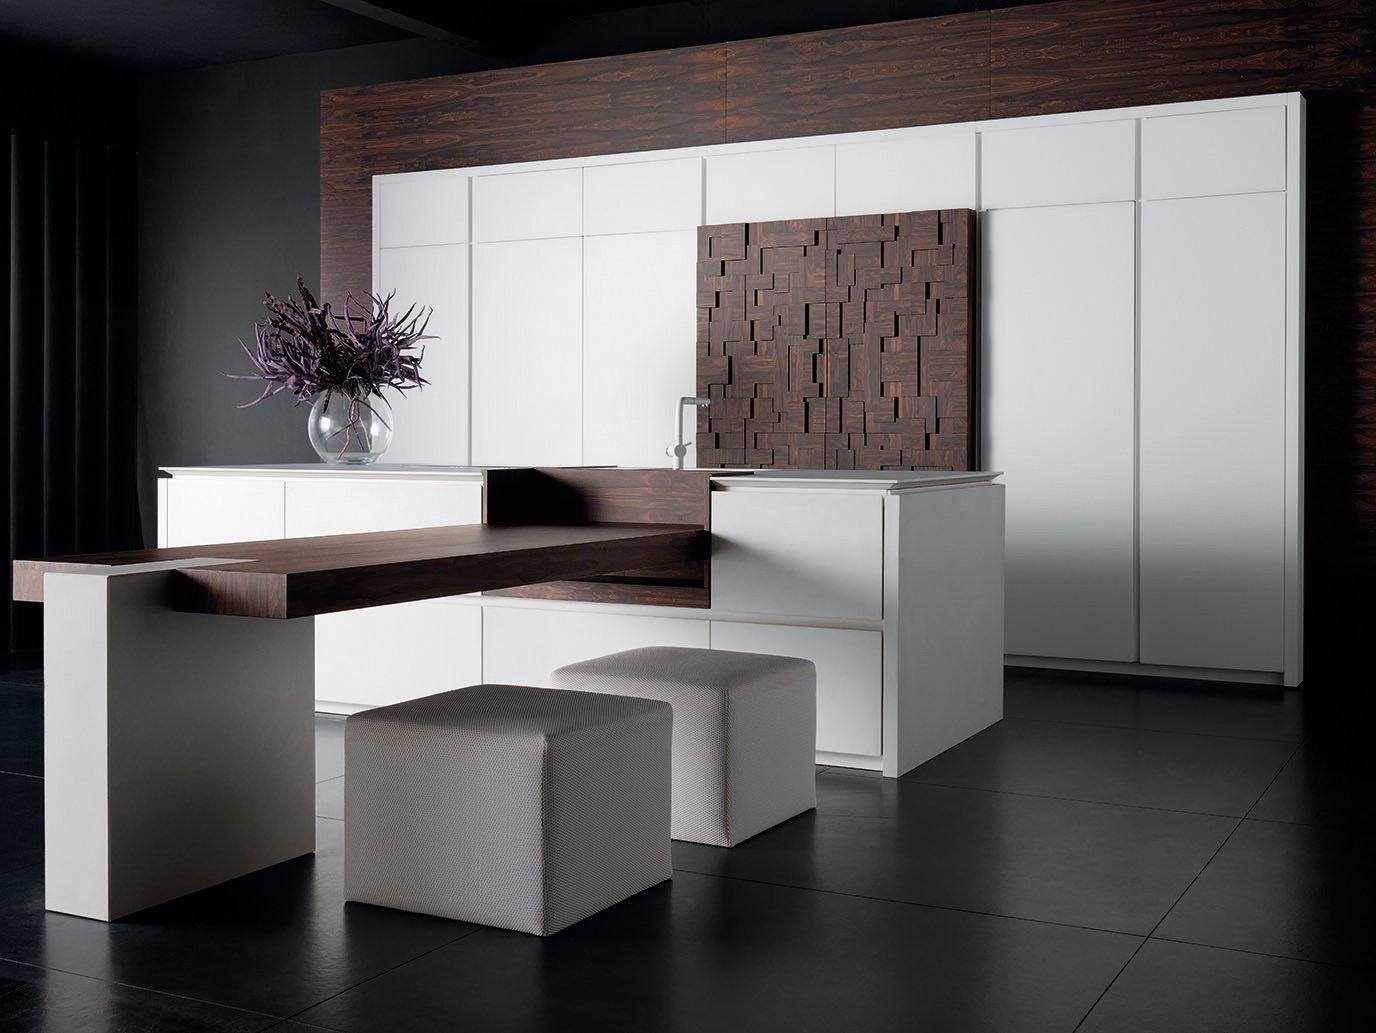 Lacquered Kitchen With Island Wind Eta Blanc By Toncelli Cucine Elegant Kitchen Design Contemporary Kitchen Hall Interior